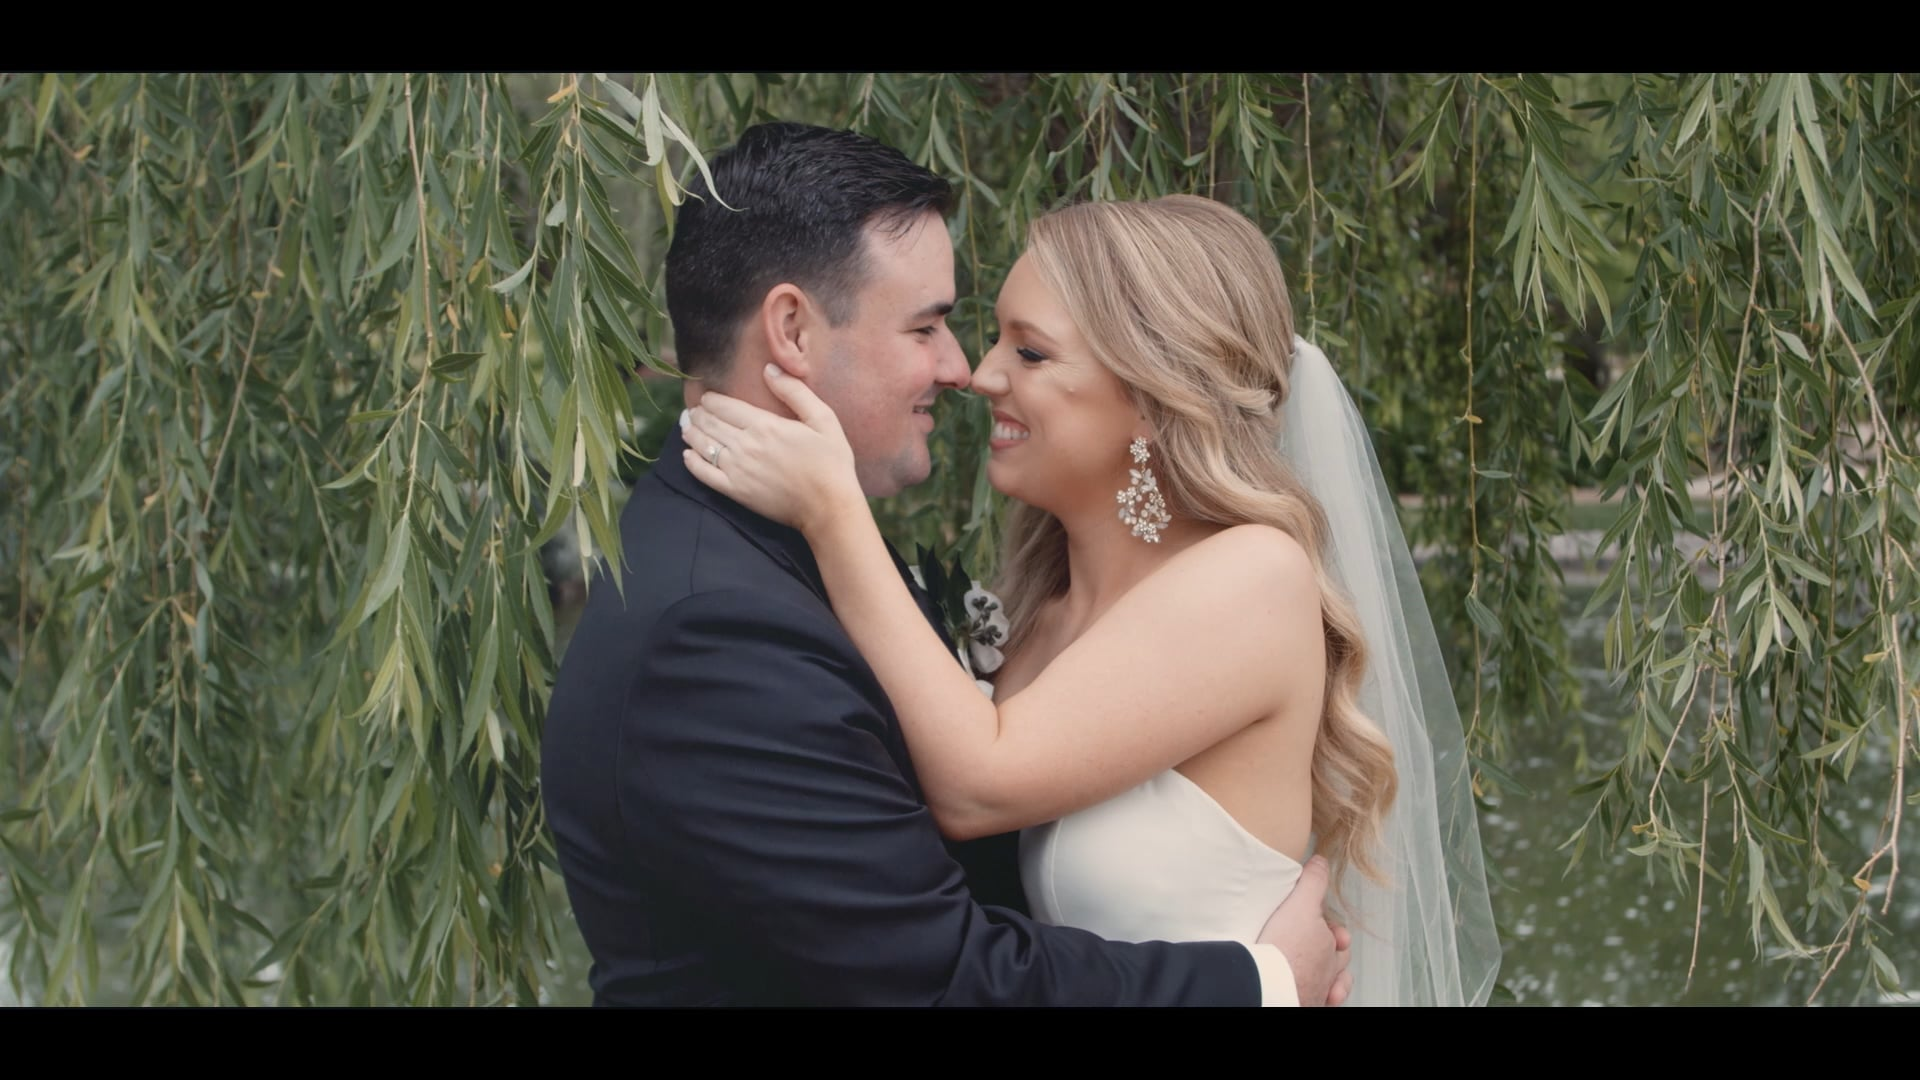 Annen Wedding Film May 5th, 2019